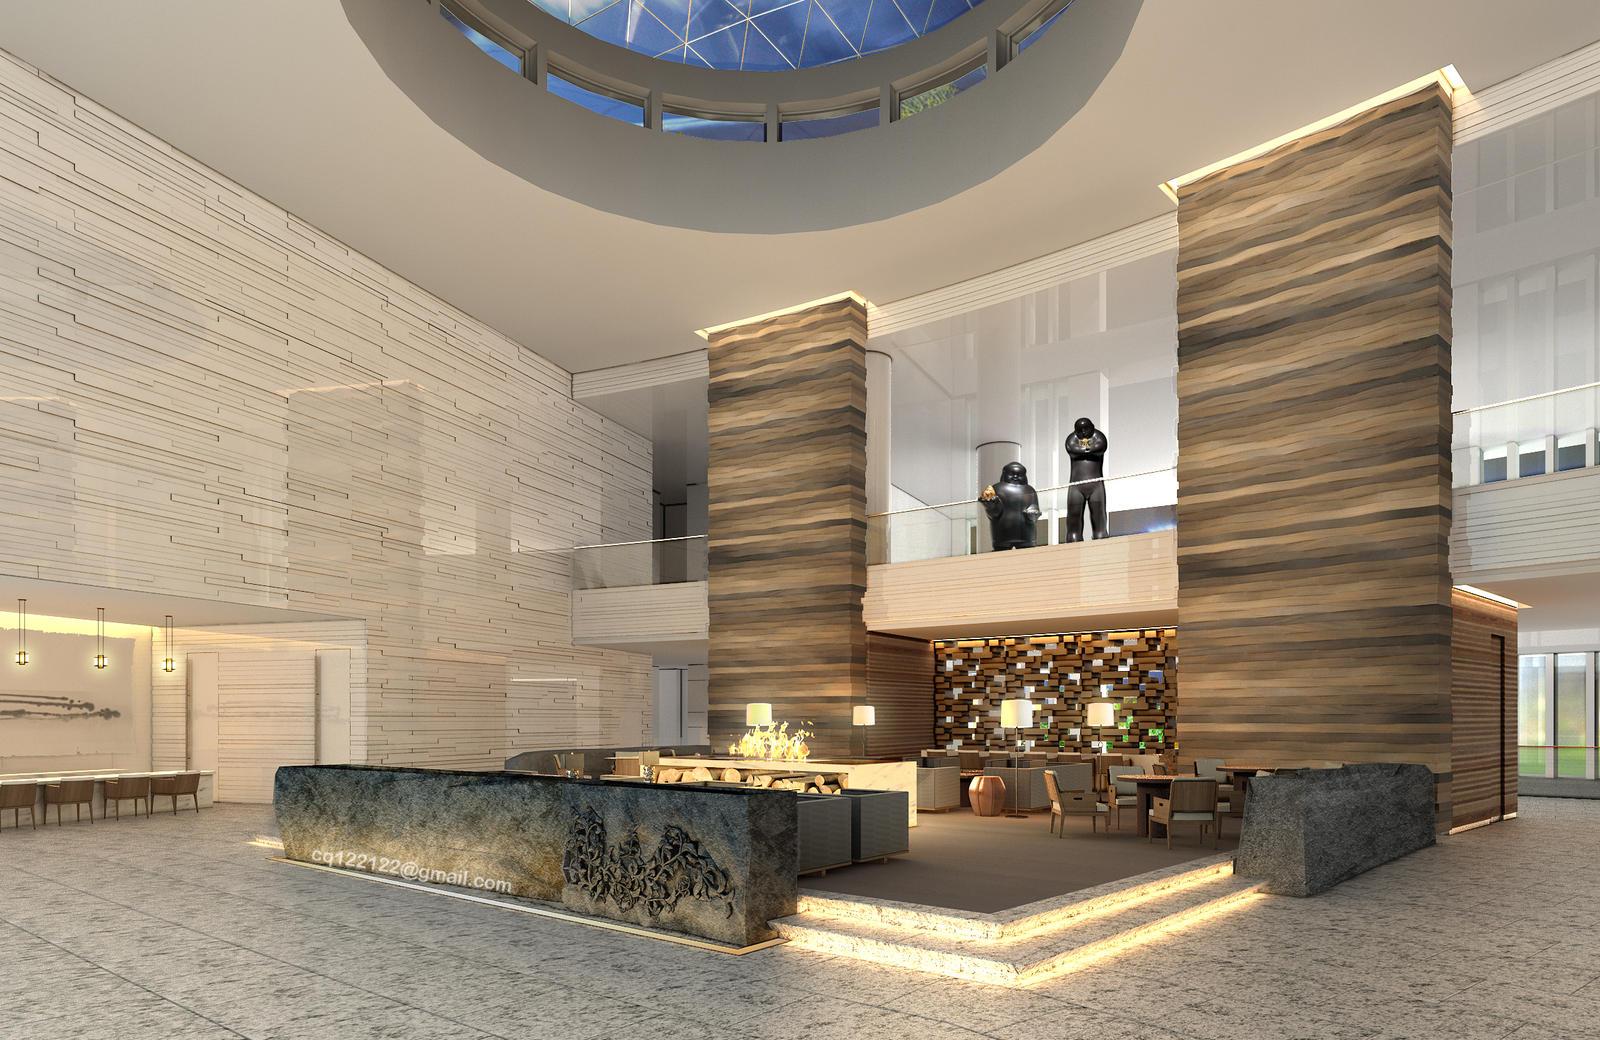 Hotel Lobby Design by DouglasDao on DeviantArt